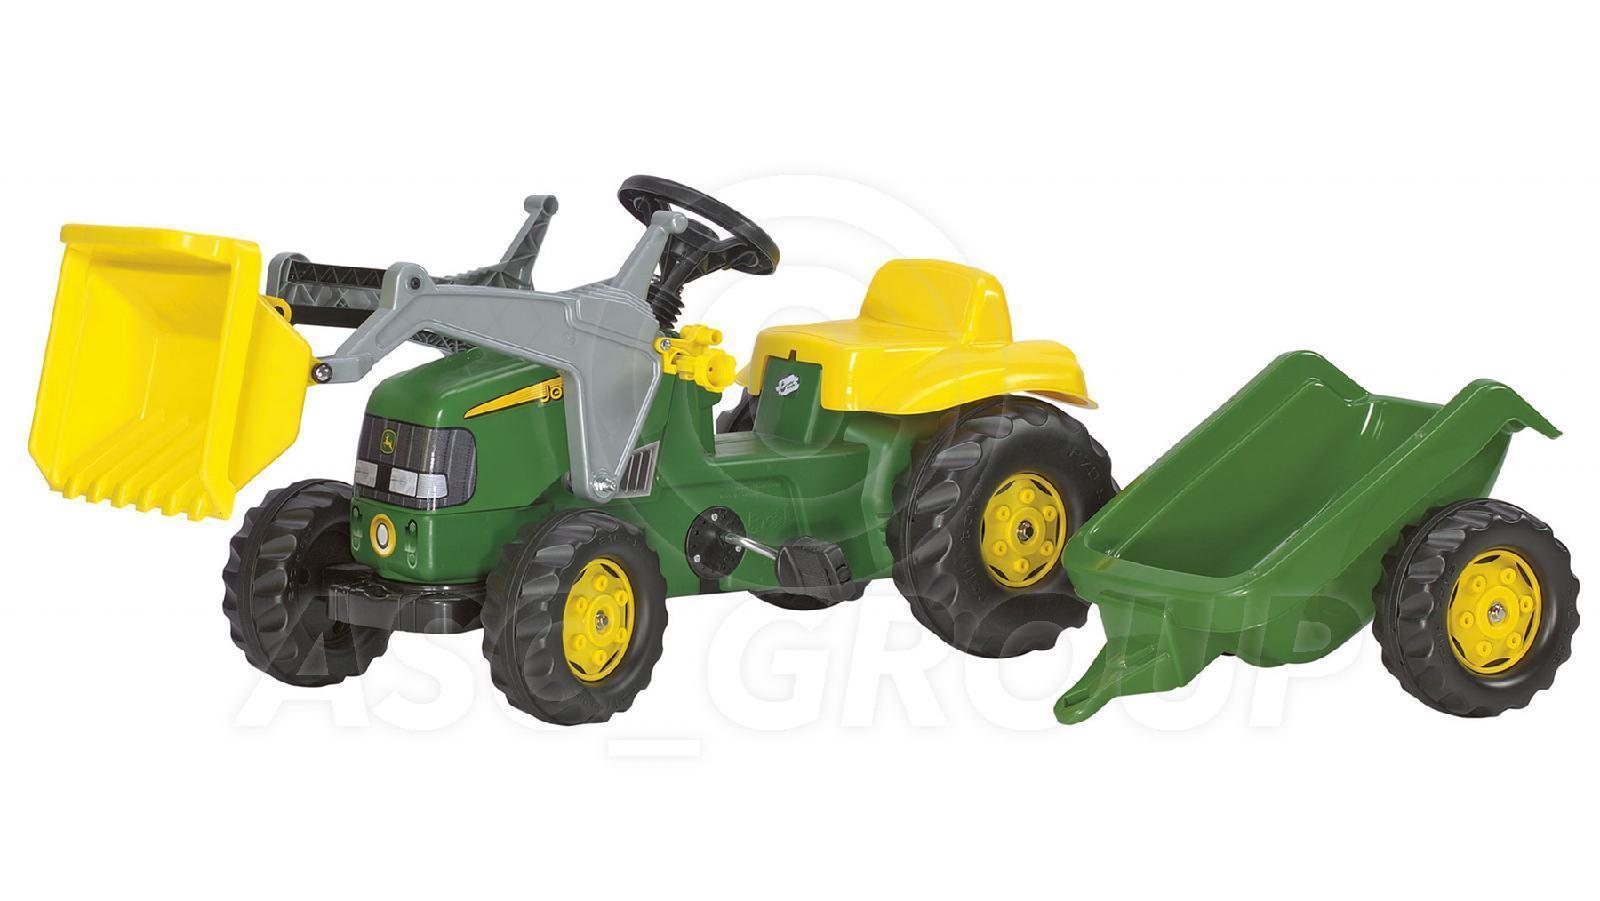 Rolly toys - John Deere Rutscher Pedal Traktor mit Lader & Anhänger Alter 2 1 2